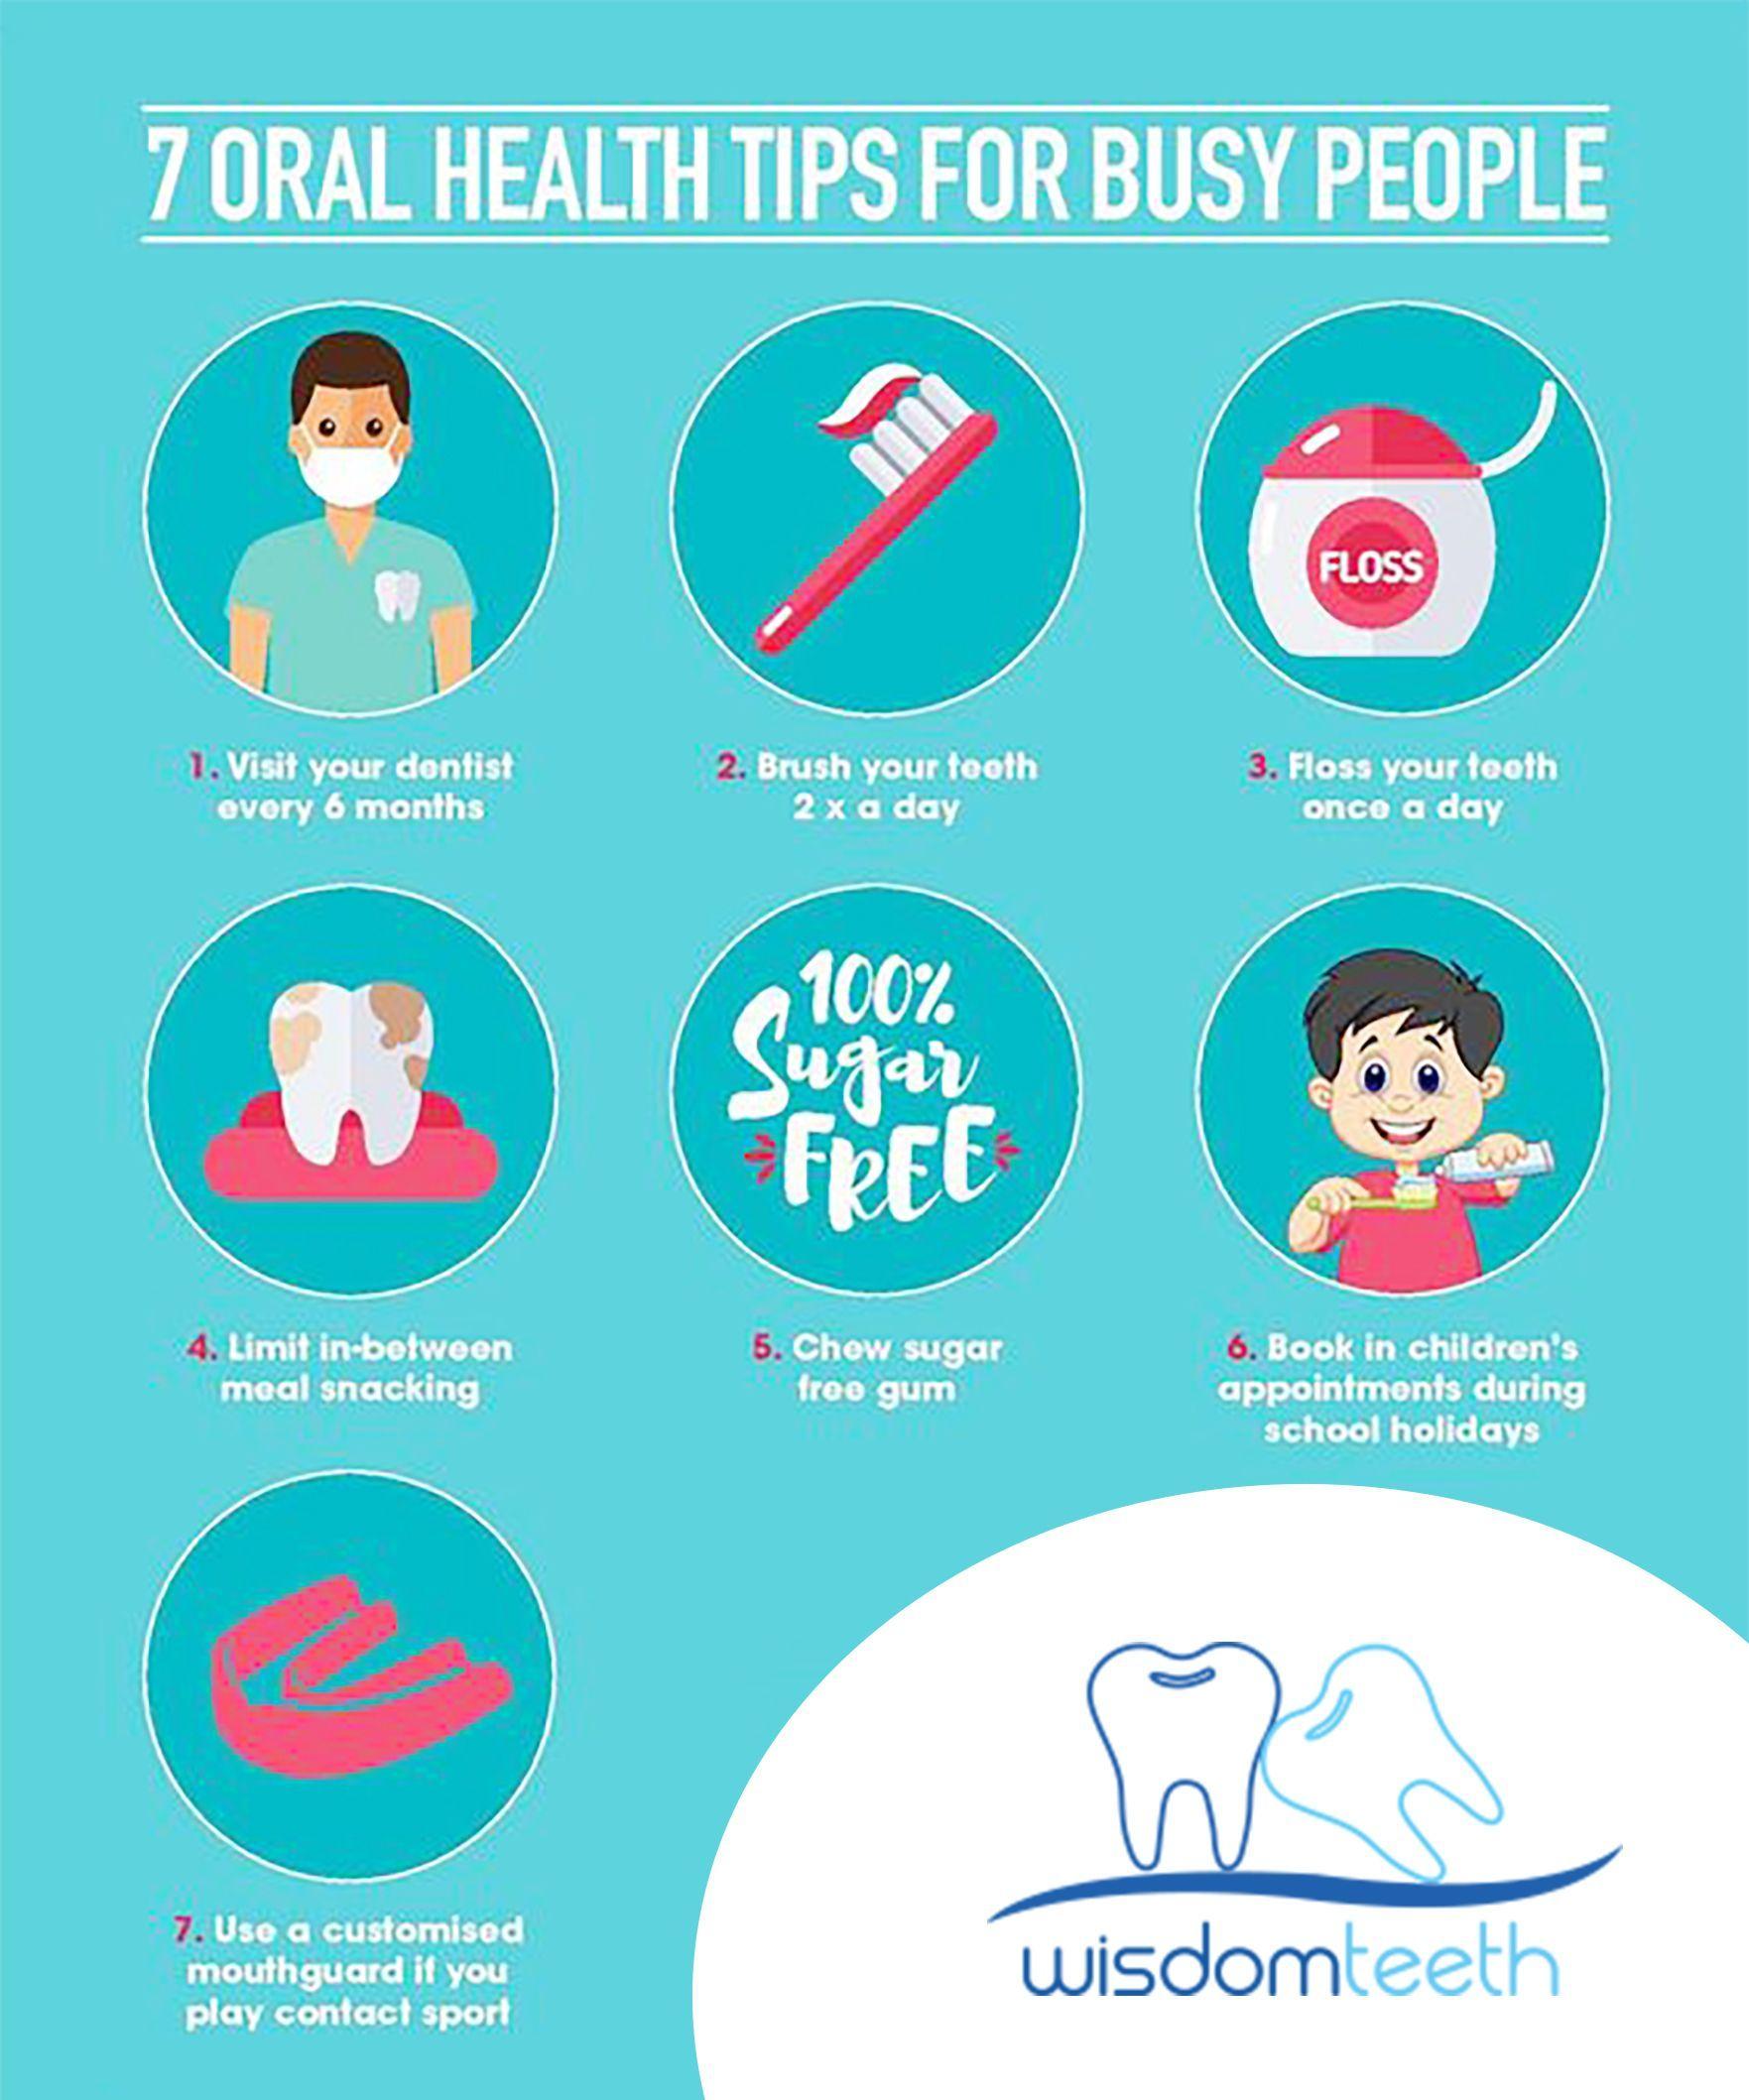 Teeth Removal Service in Chatswood Wisdom Teeth Dentist